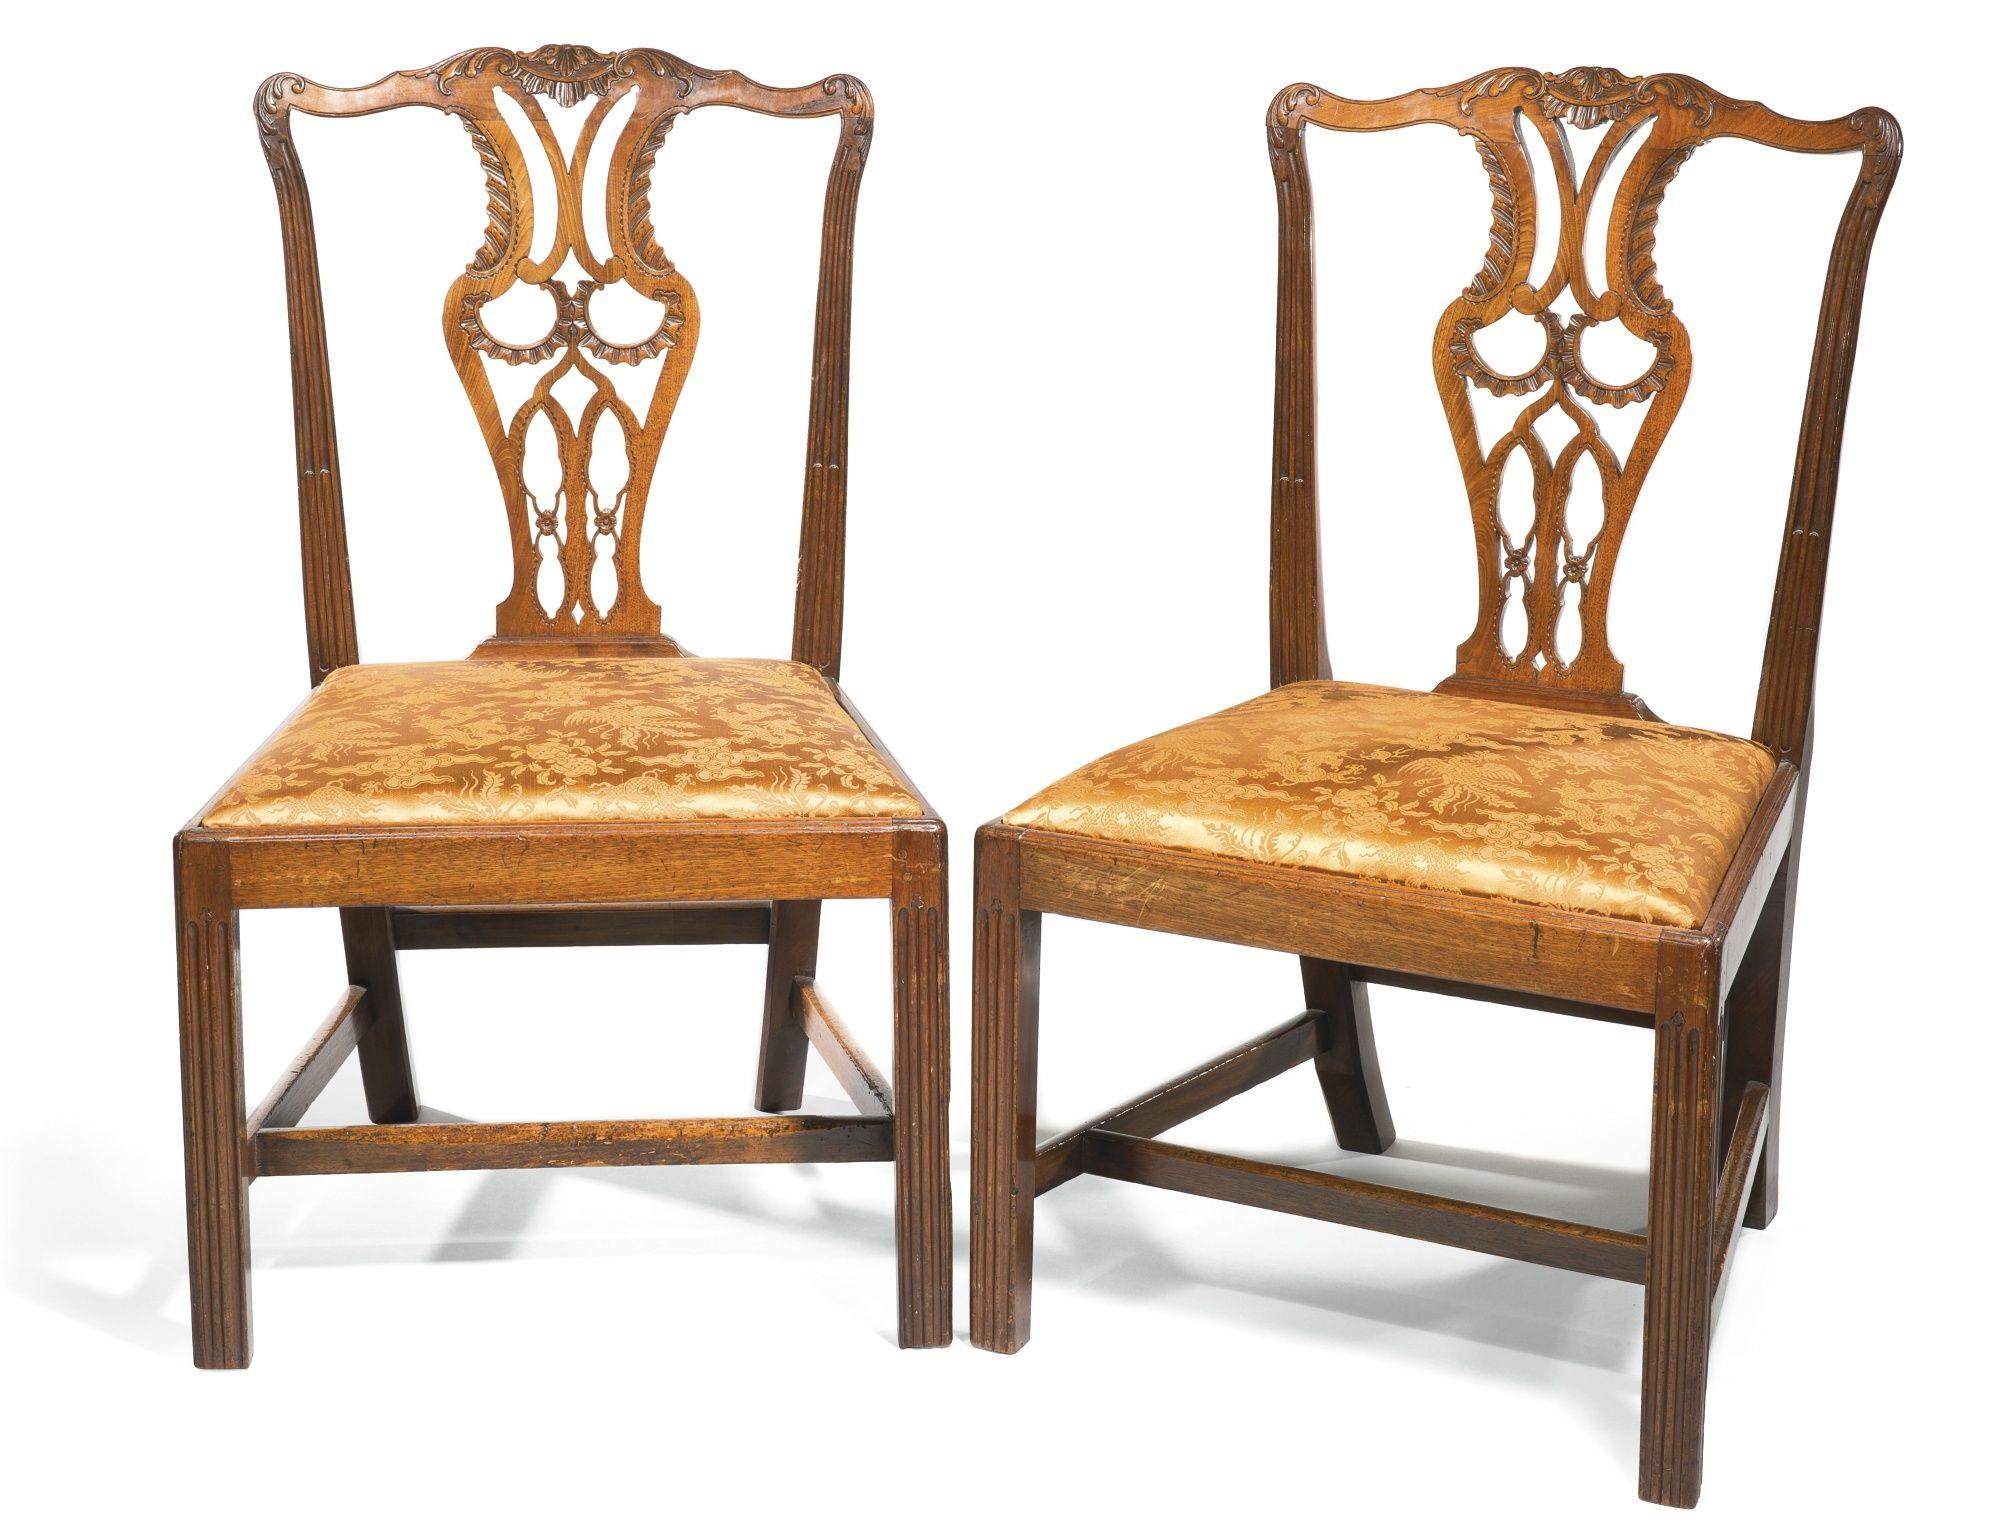 Sedie Bambu ~ Oltre 25 fantastiche idee su sedie chippendale su pinterest